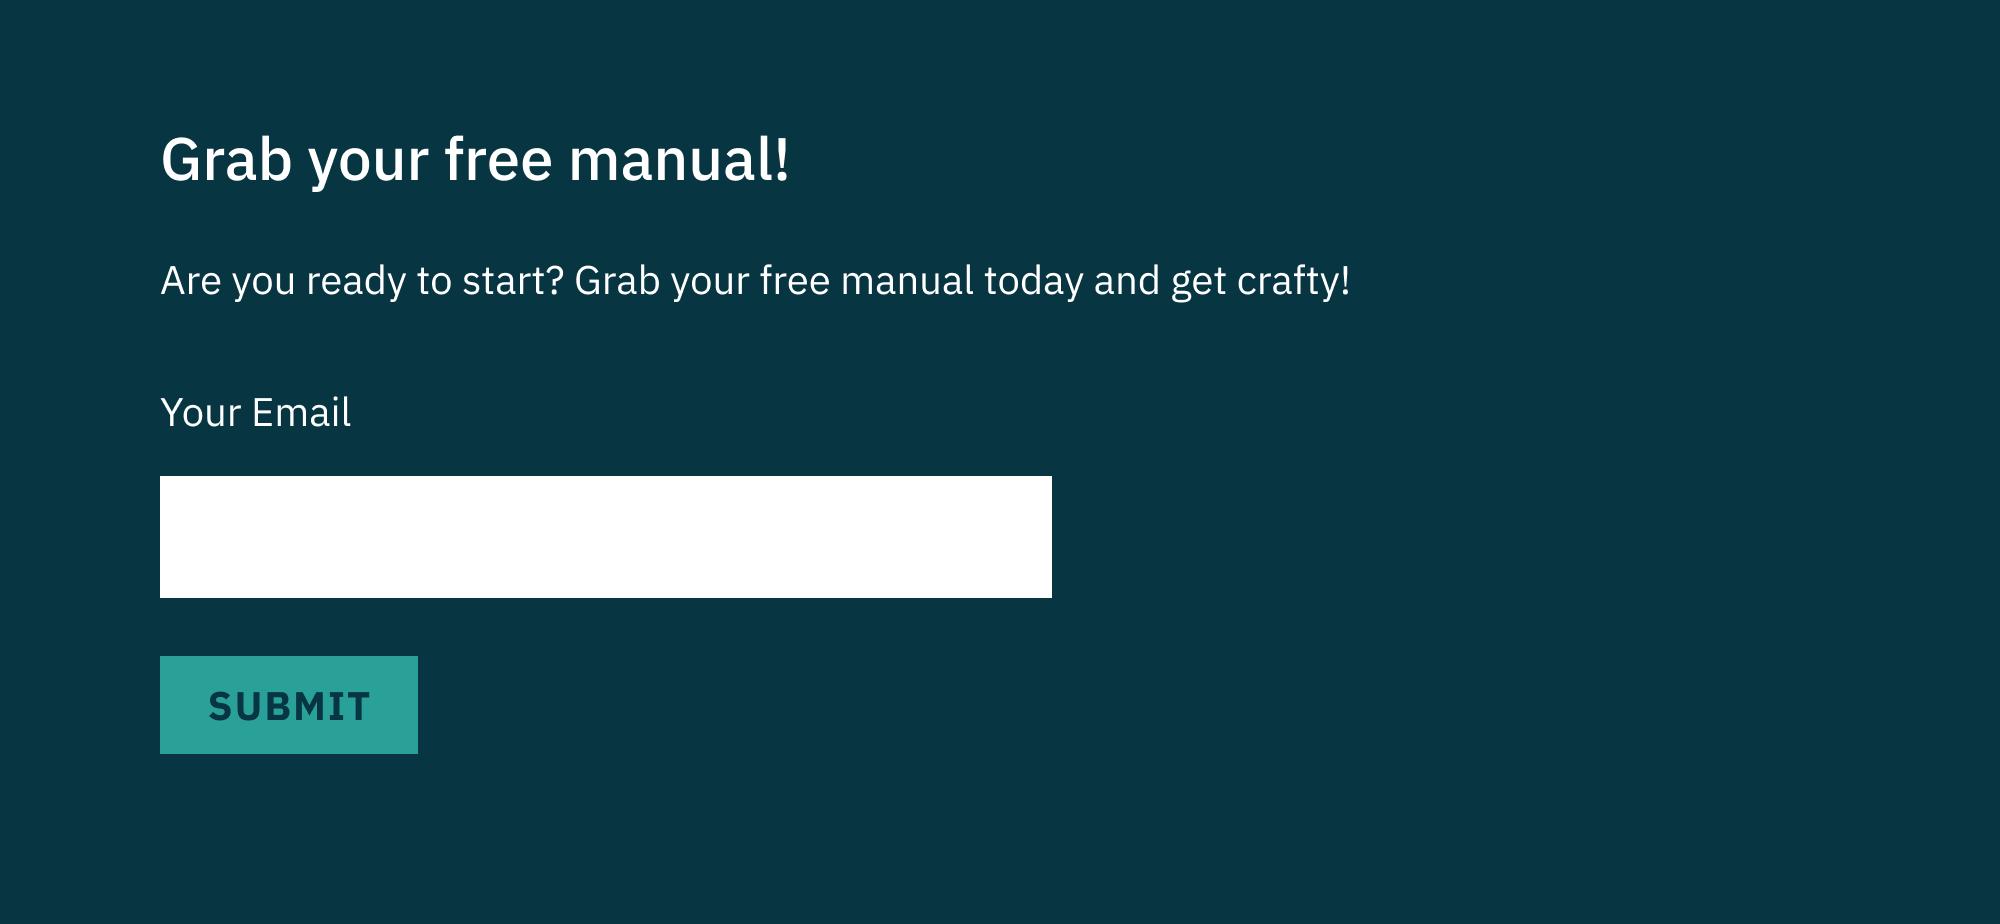 Free manual